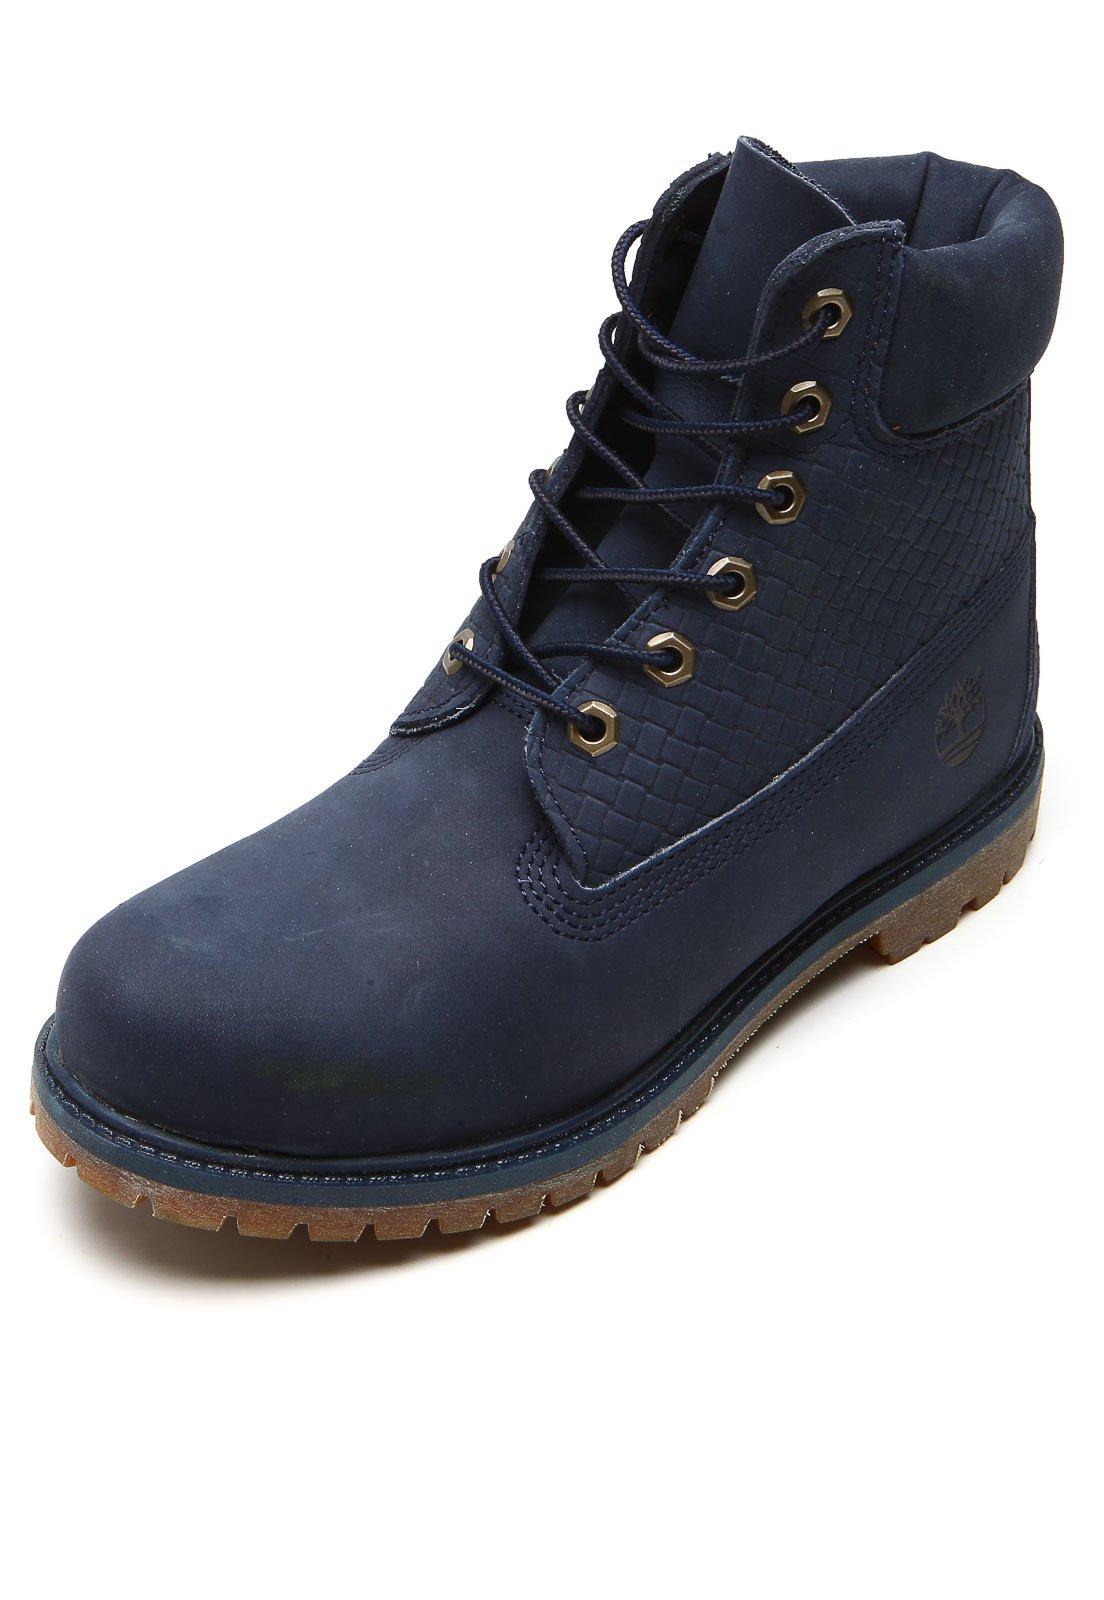 96a329c7a8 Timberland. Bota Couro Timberland Yellow Boot ...